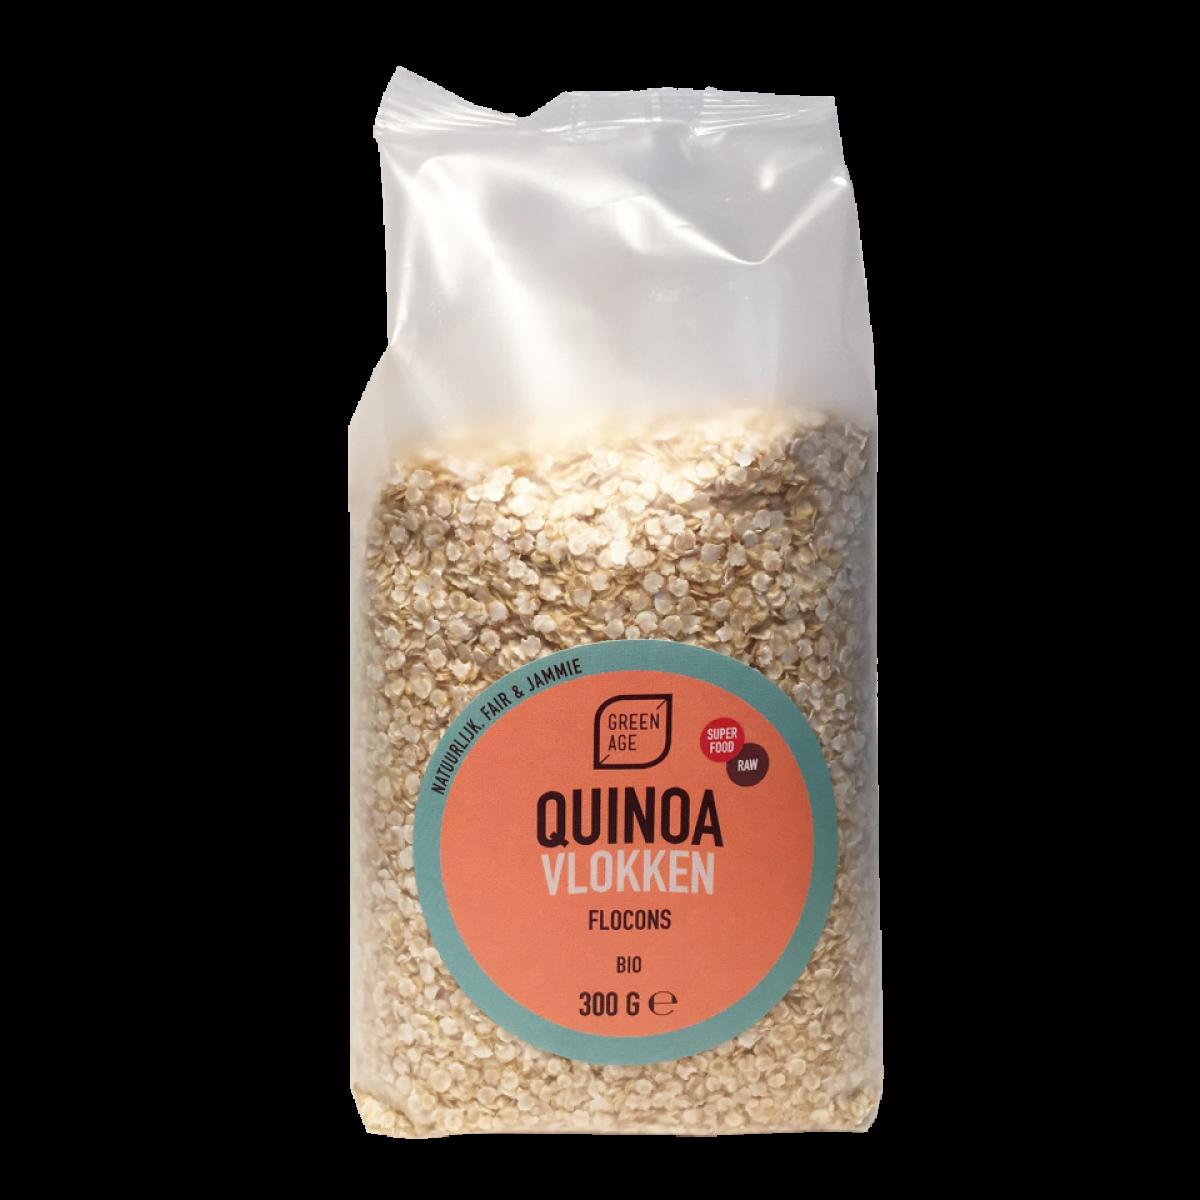 Quinoa Vlokken